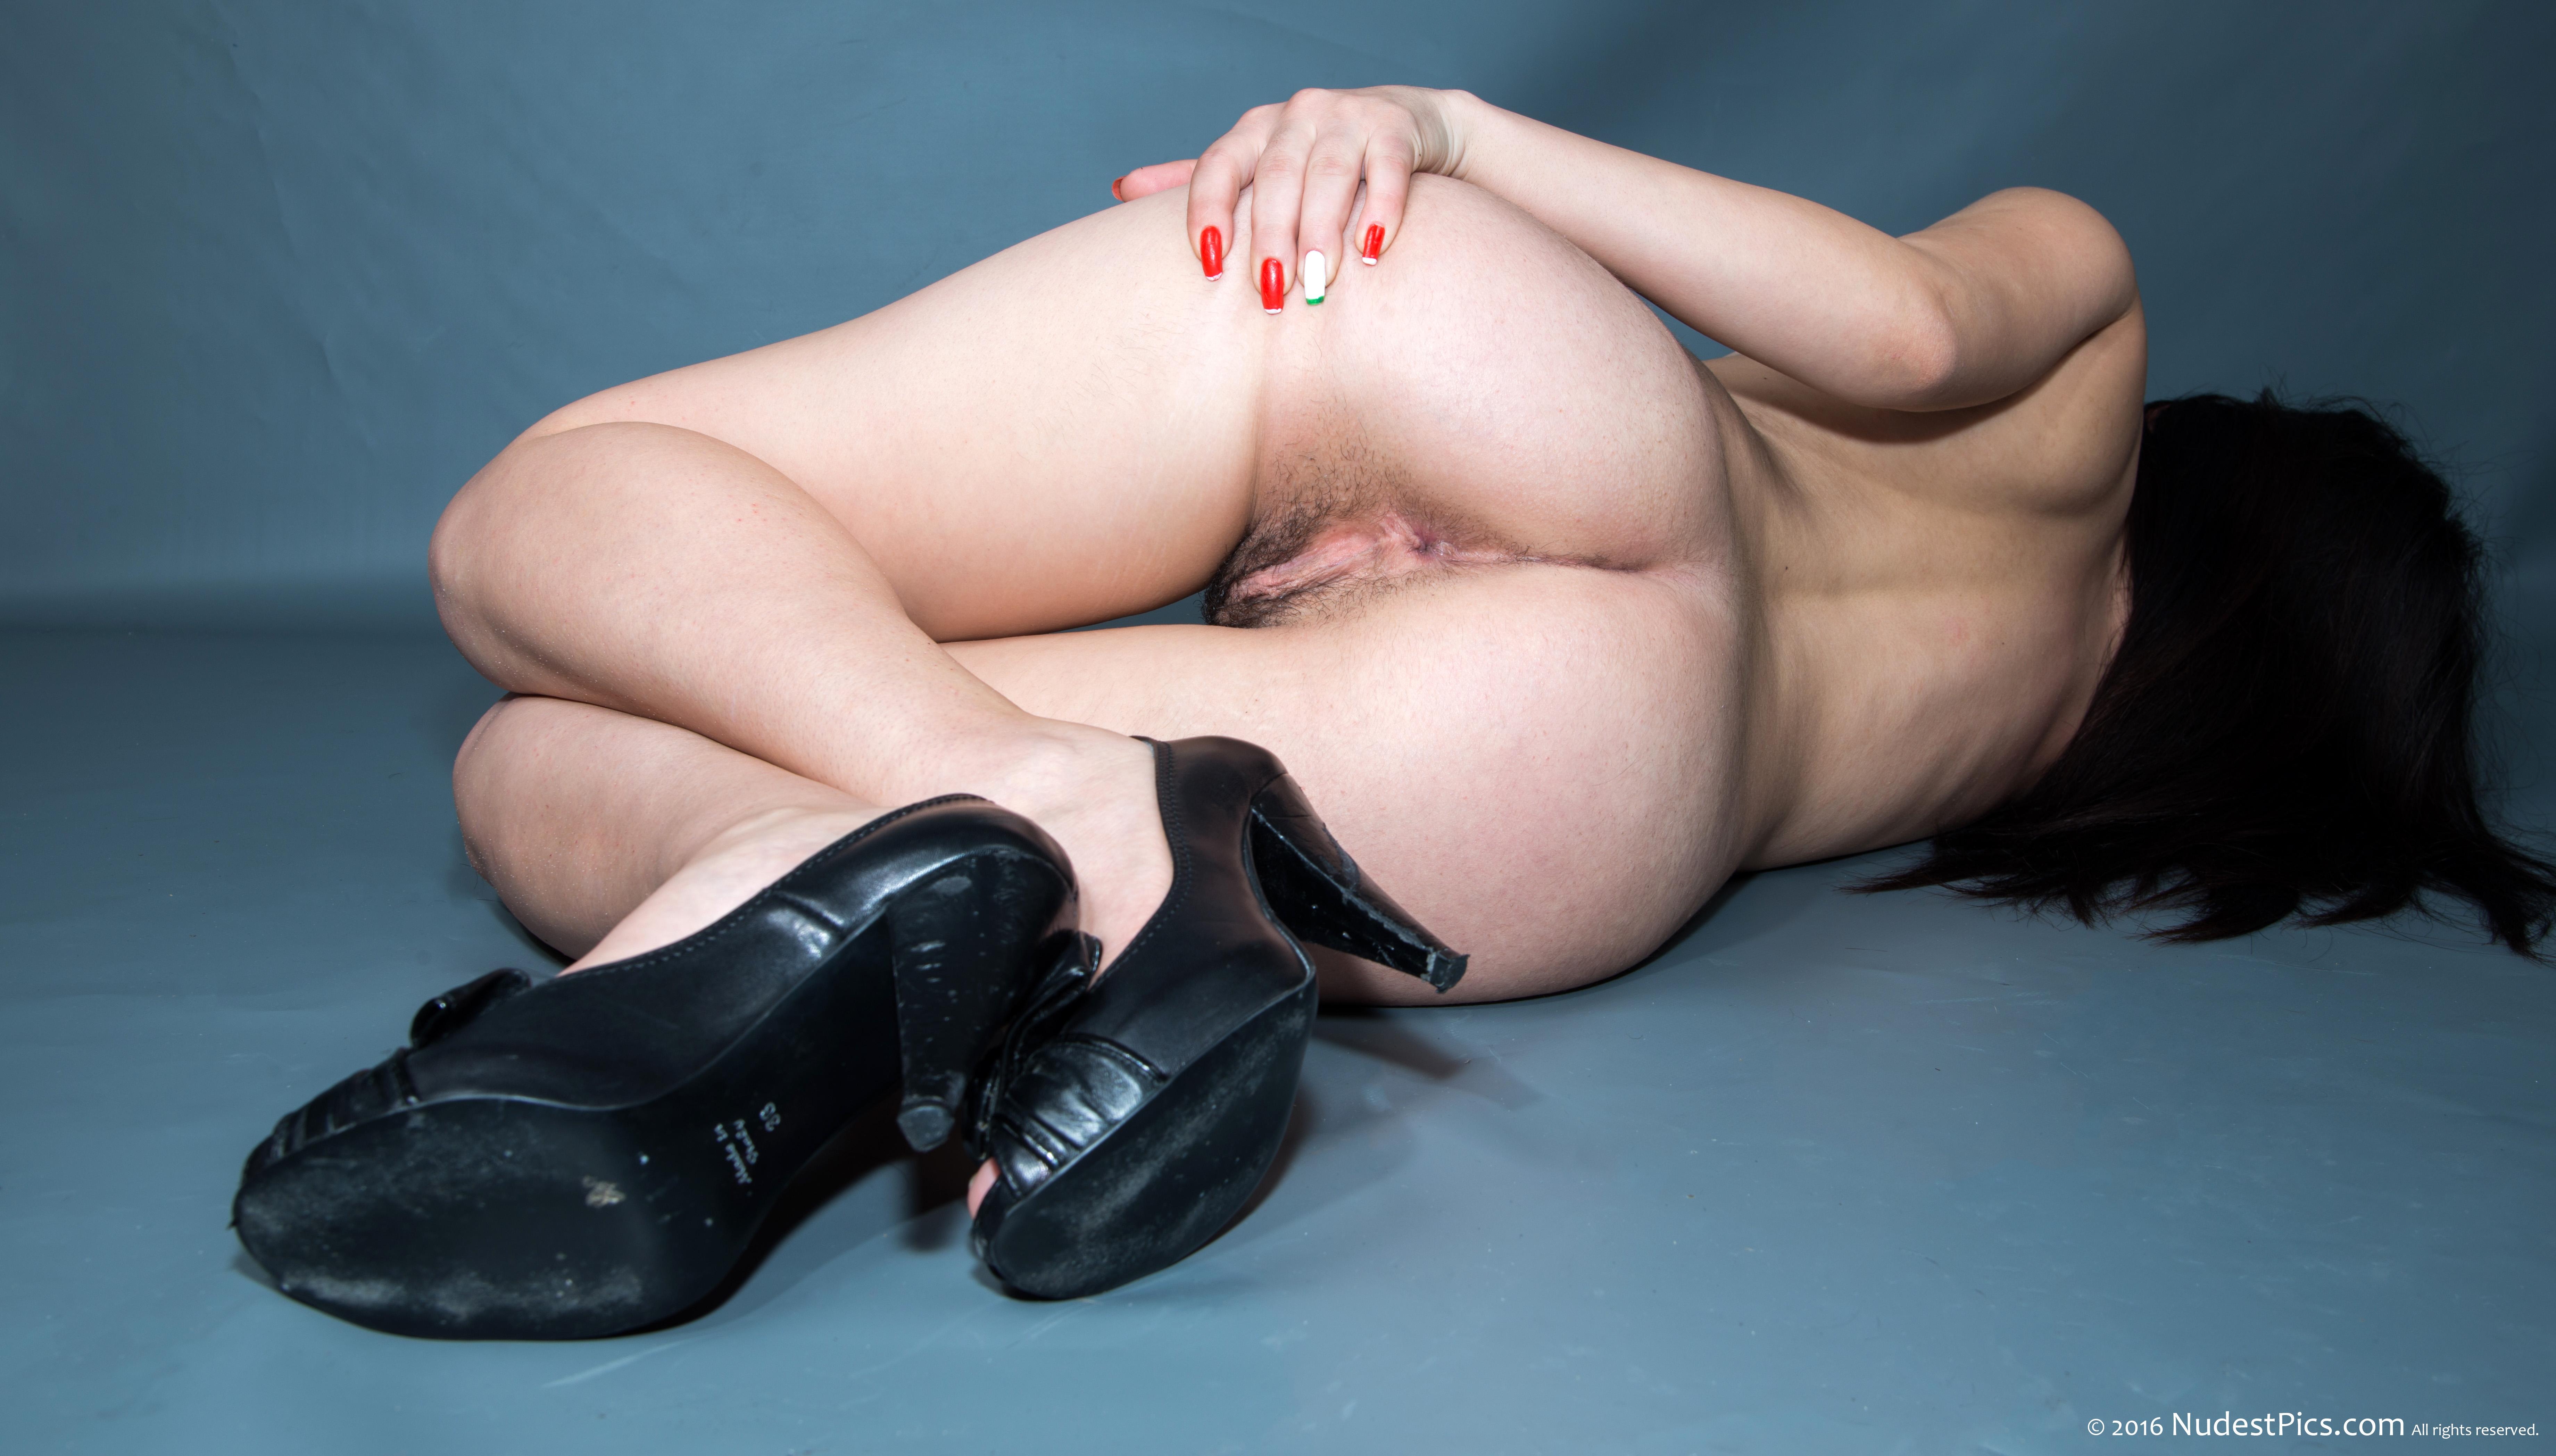 Nude Mademoiselle Hairy Butt Spreading Sideways full HD